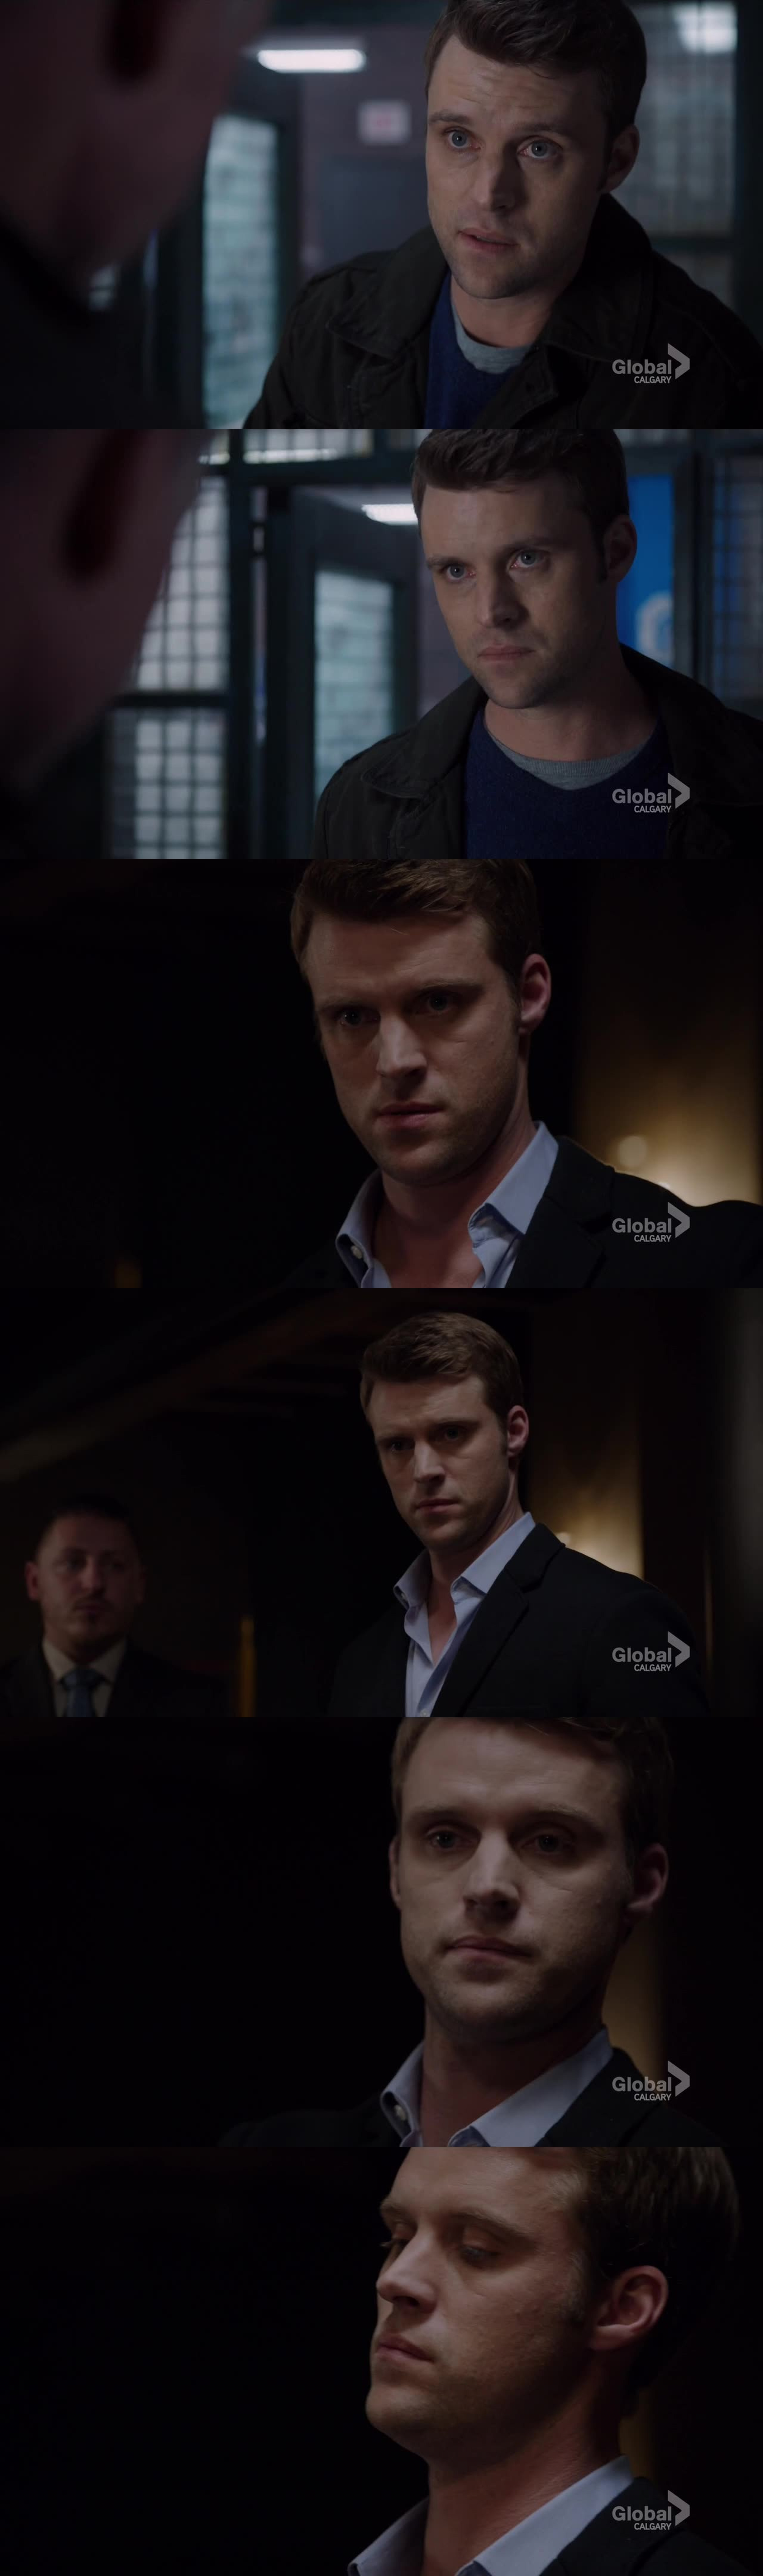 "I was like ""Noooooooooo!!!!!"" If something happens to him, I swear to god...!!!!!!!!!!!! I need him to be okay!!!!! He is my everything!!!!!"